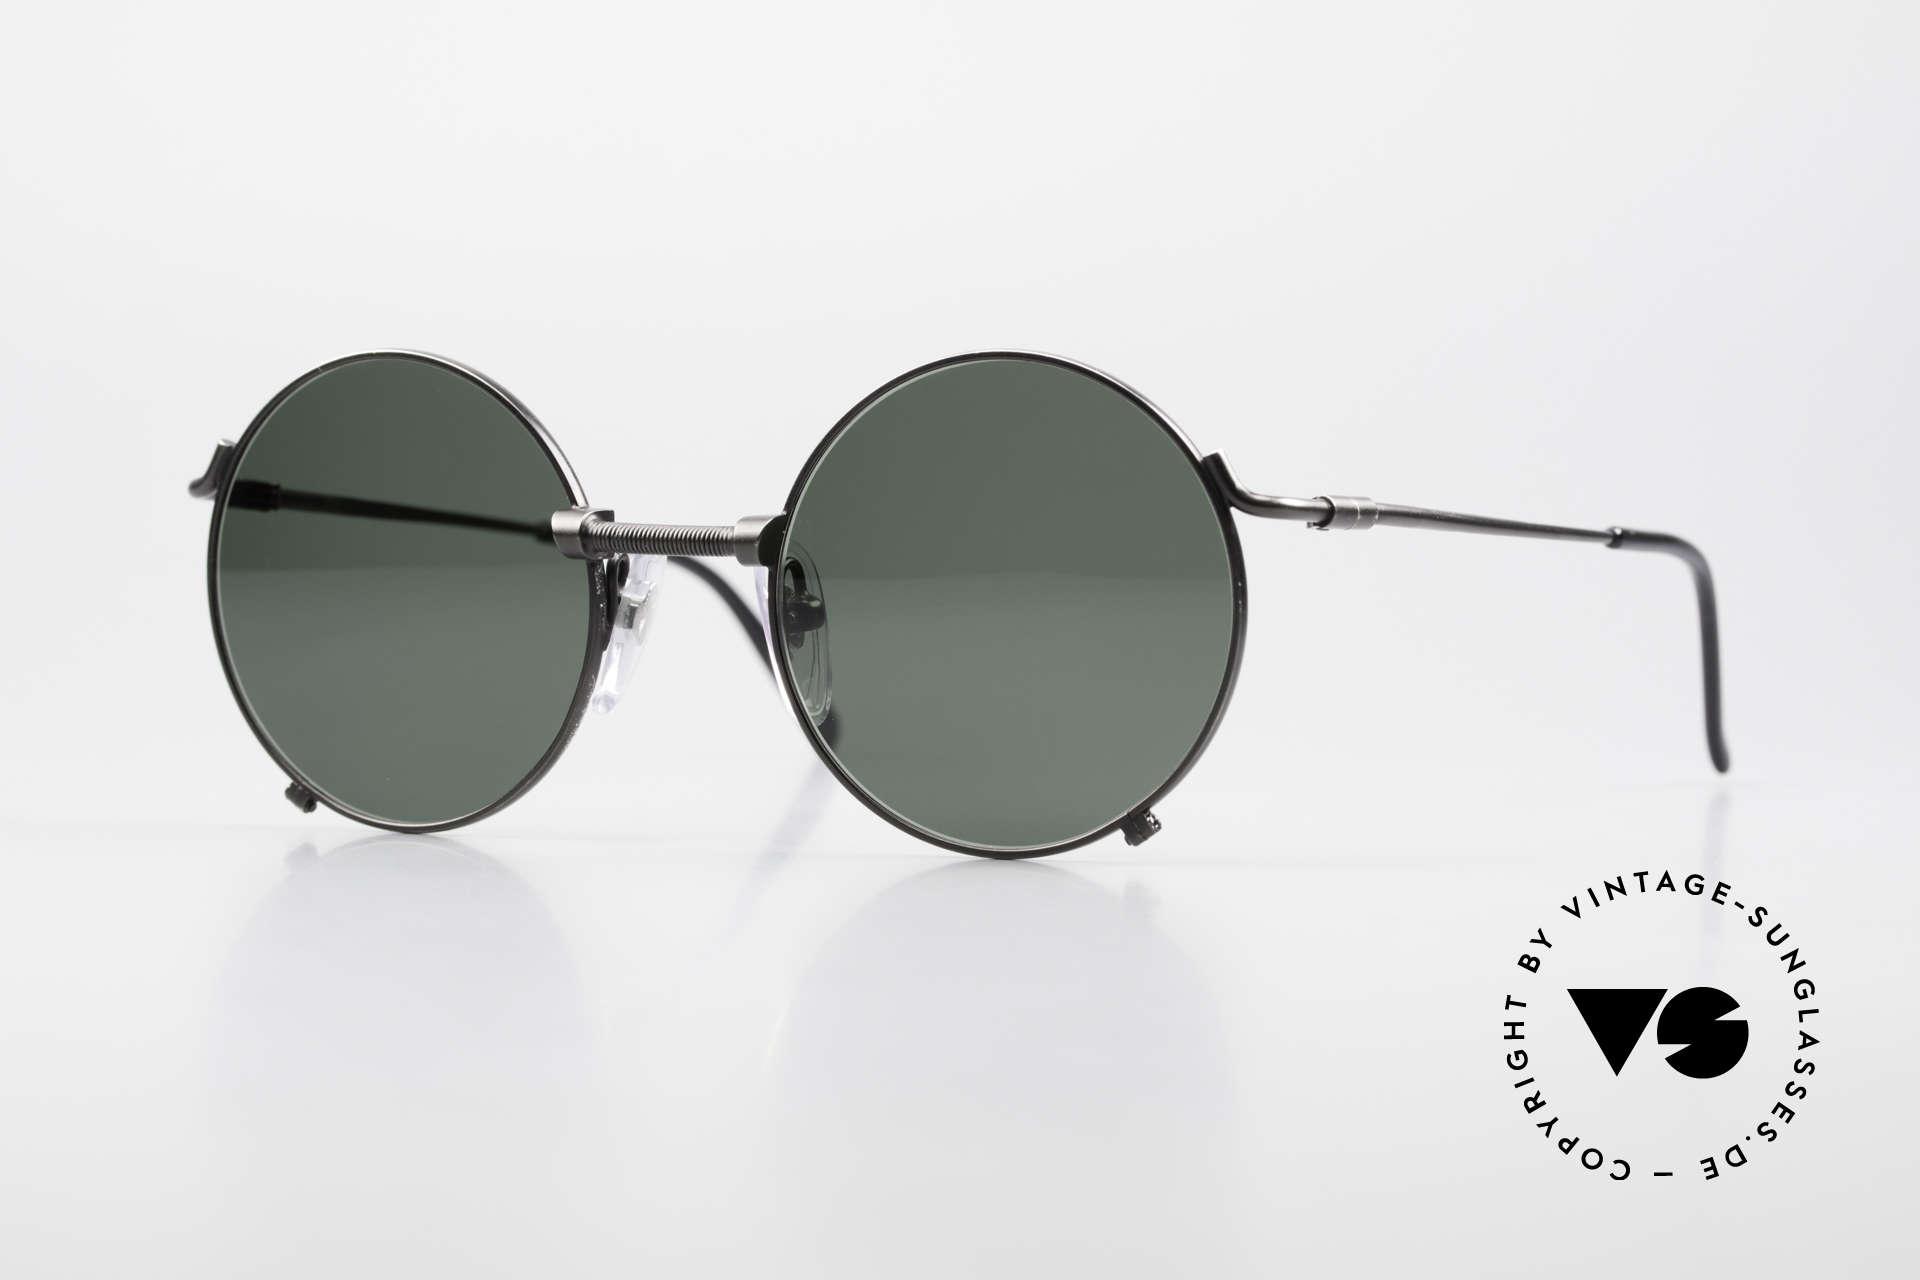 Jean Paul Gaultier 55-7162 Round Vintage Sunglasses 90s, timeless 90's sunglasses by Jean Paul Gaultier, Made for Men and Women